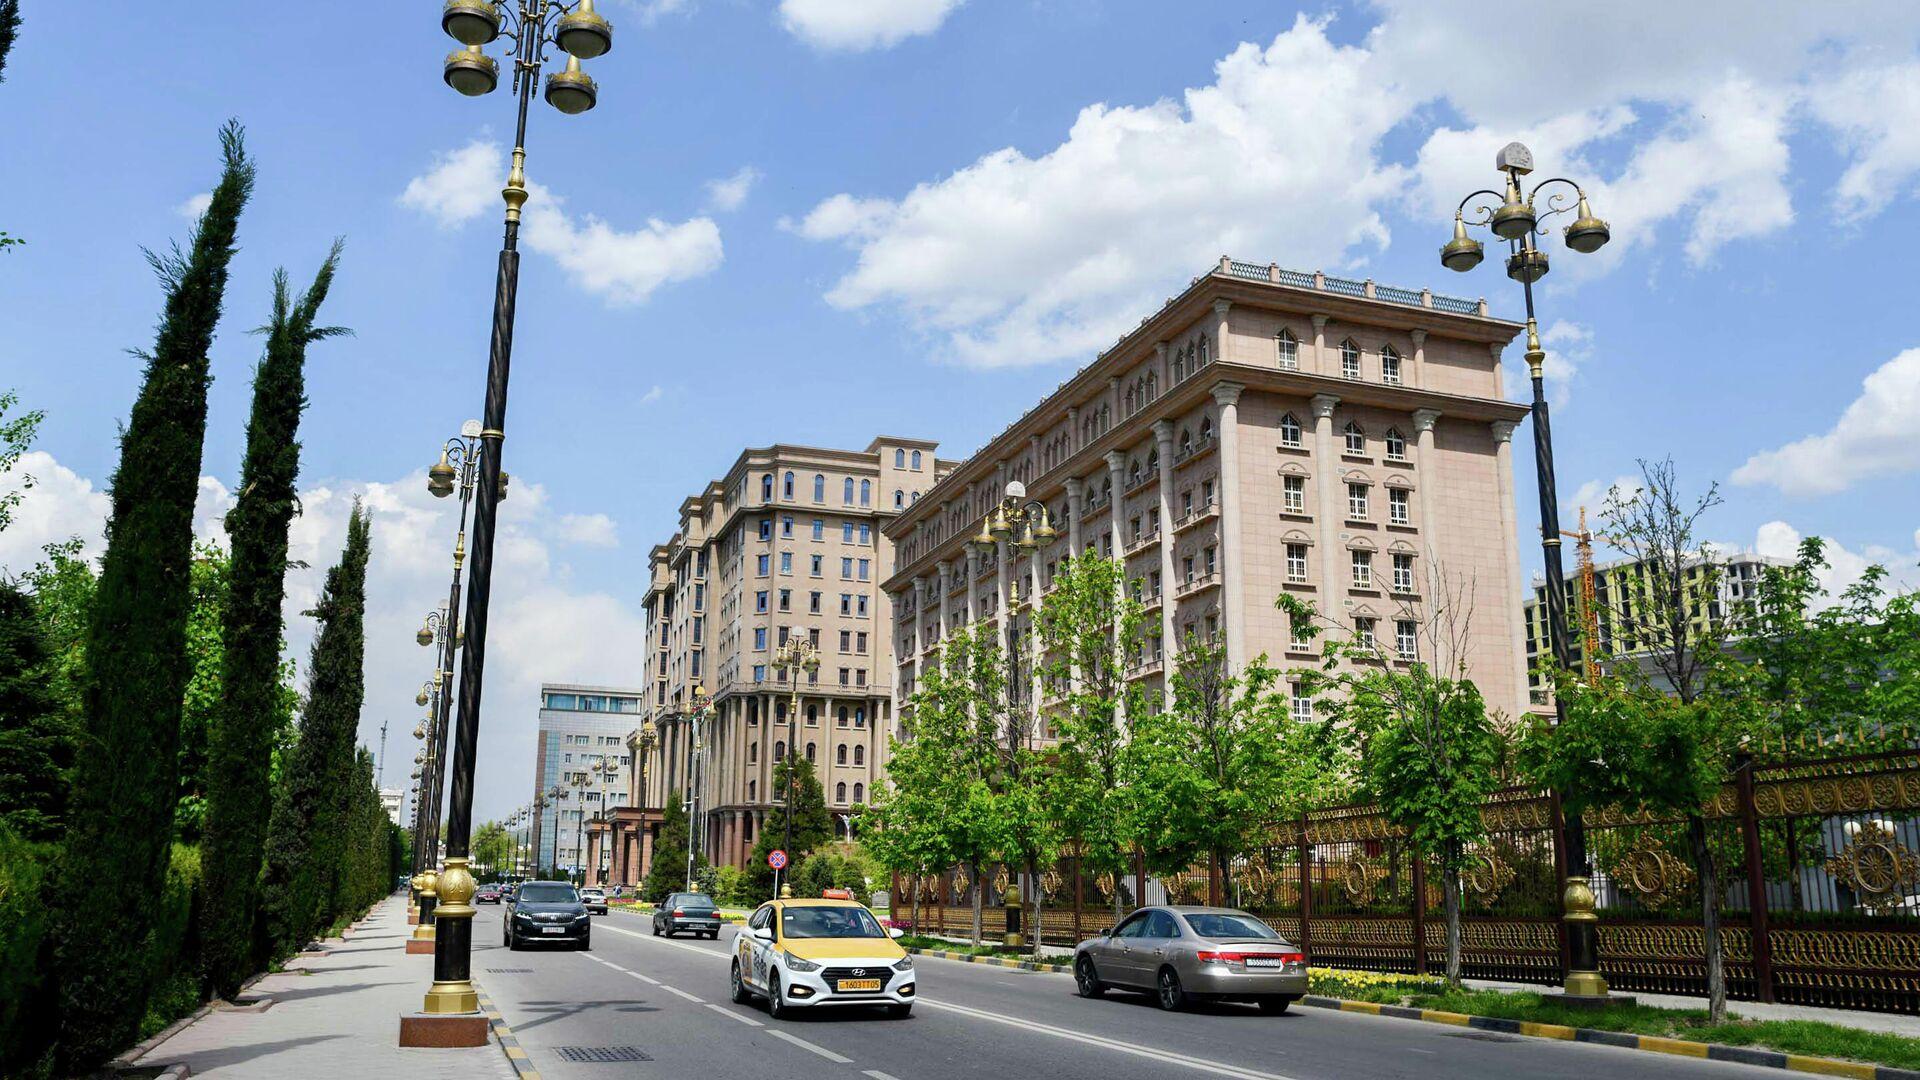 Здание МИД Таджикистана в Душанбе, архивное фото - Sputnik Таджикистан, 1920, 04.06.2021